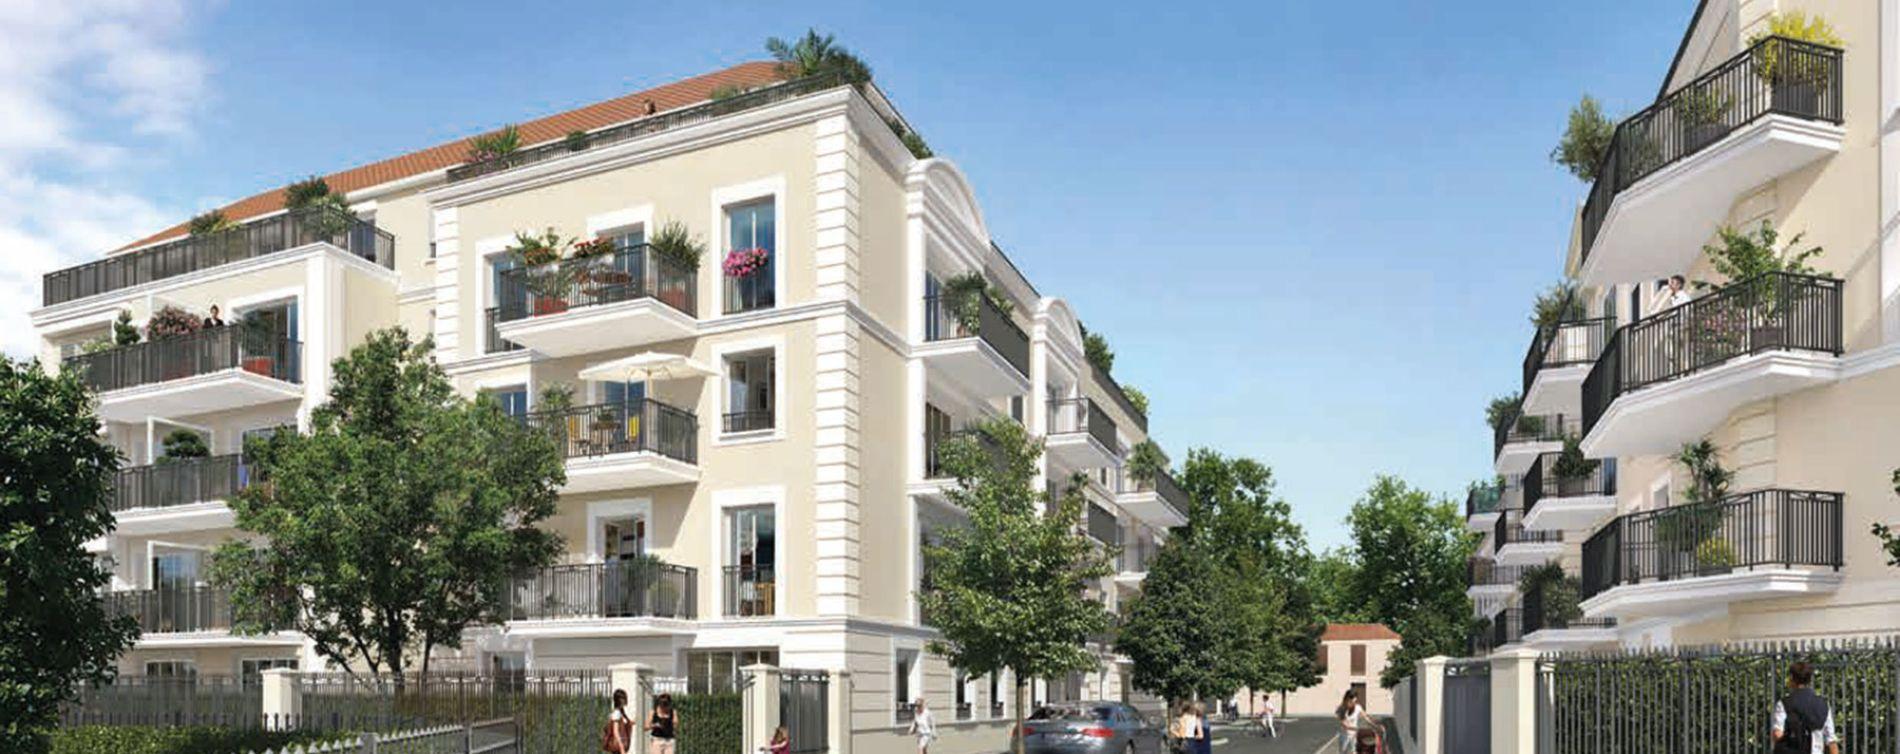 Noisy-le-Grand : programme immobilier neuve « Programme immobilier n°214501 » (2)